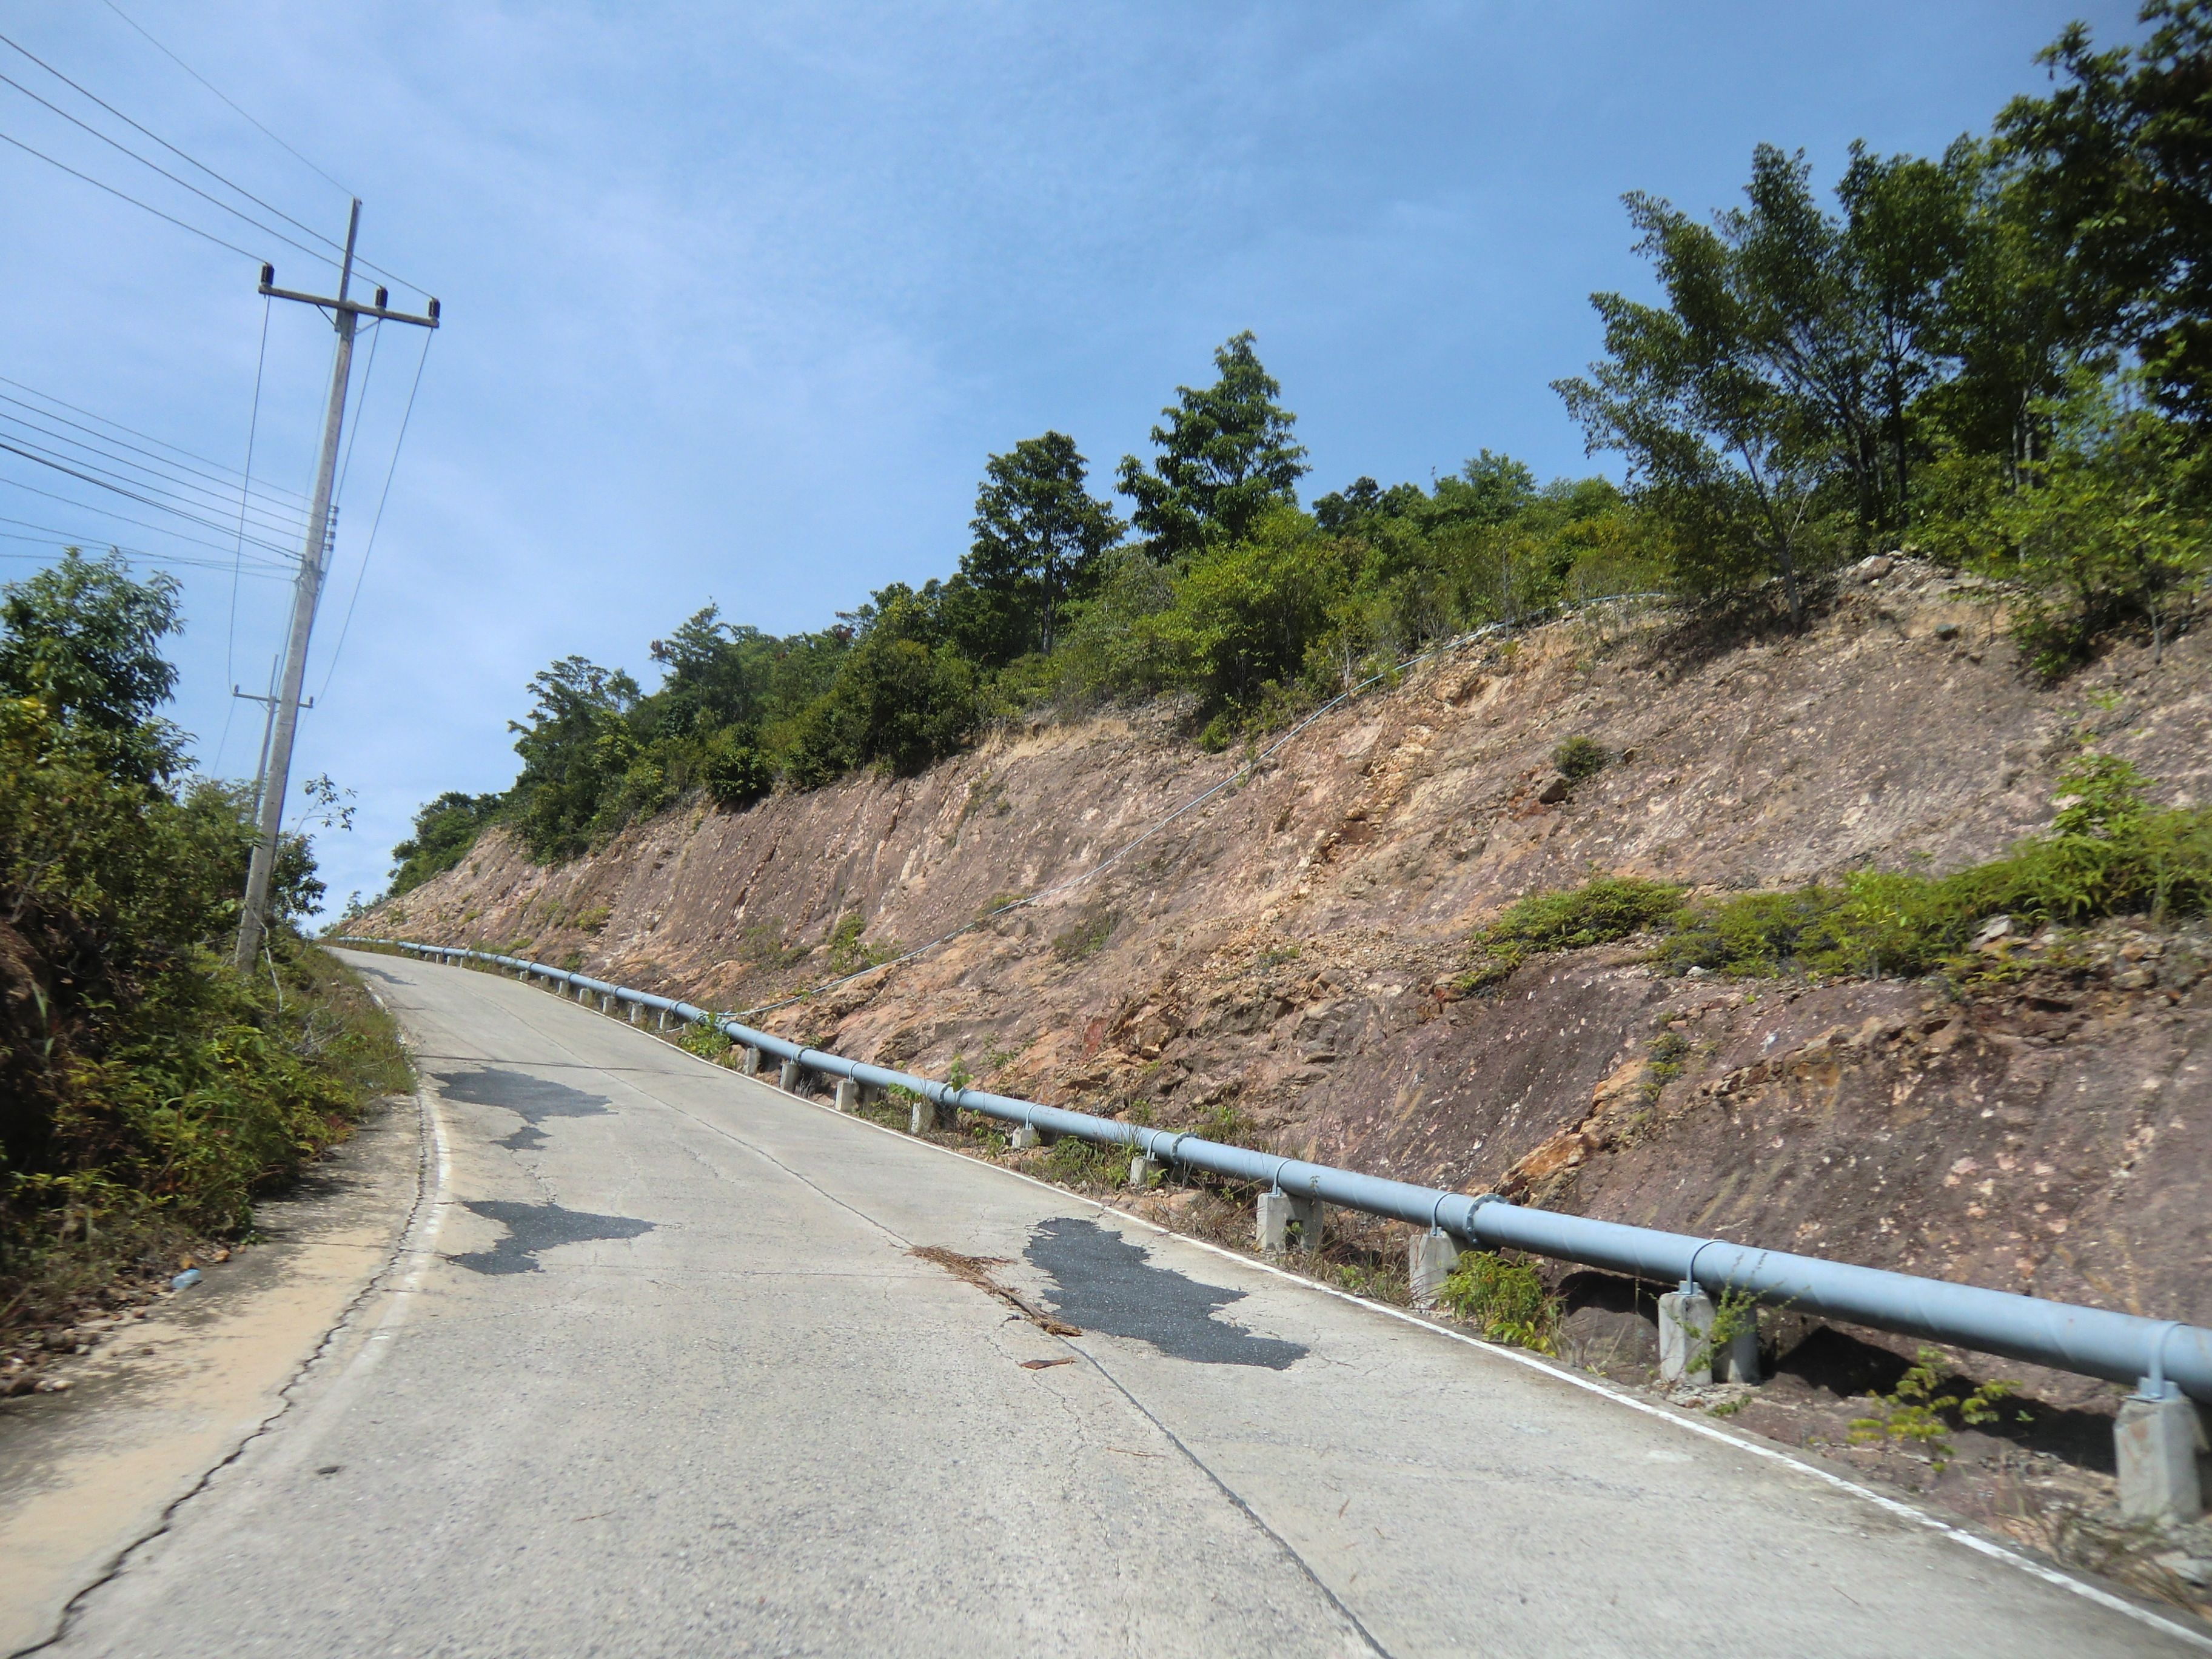 Koh Phangan - Umzug zum Mae Haad Beach und Besuch vom Wang Sai Wasserfall 1